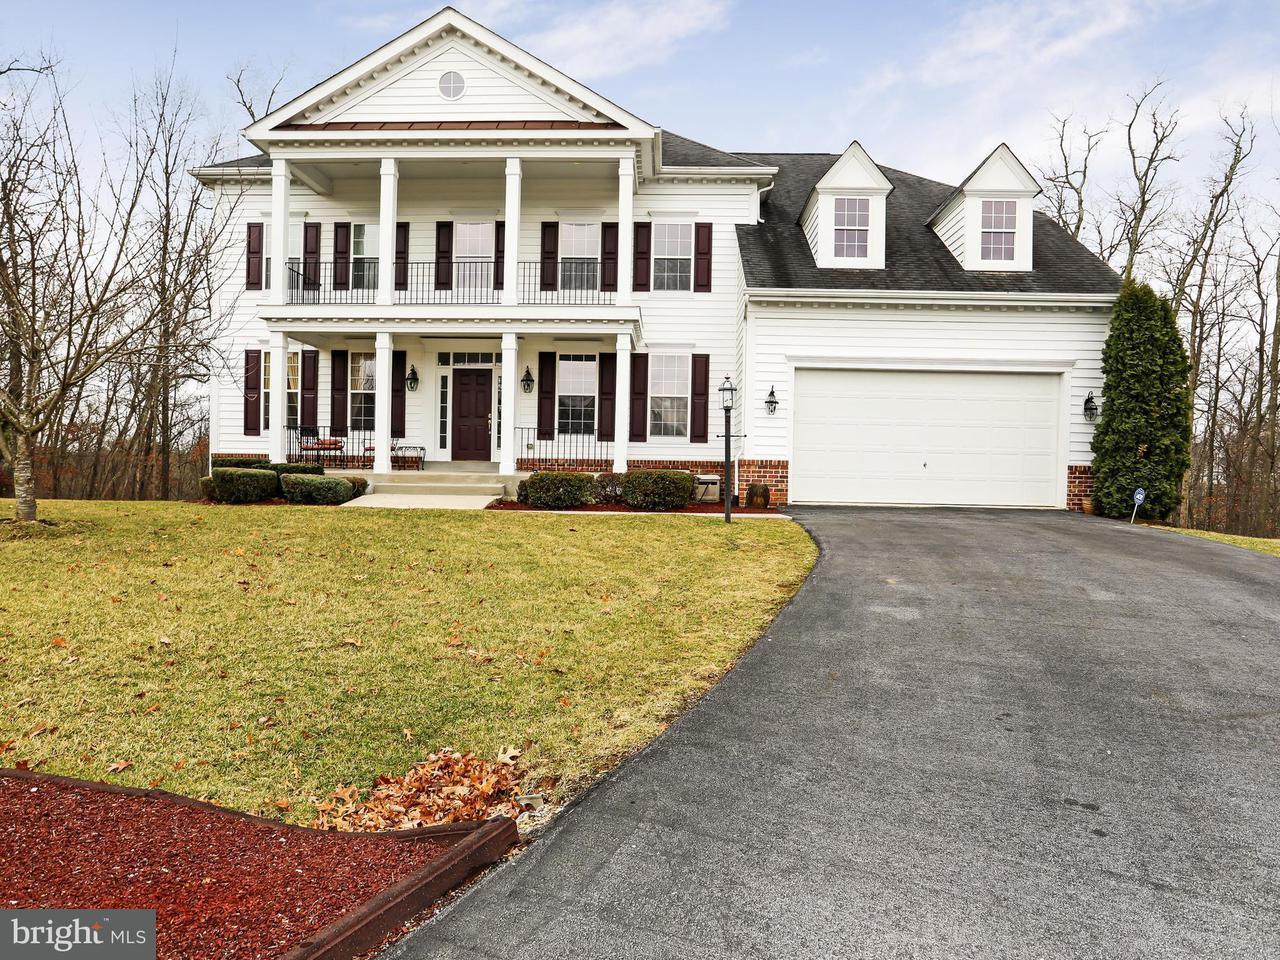 独户住宅 为 销售 在 121 Aquifer Drive 121 Aquifer Drive Falling Waters, 西弗吉尼亚州 25419 美国